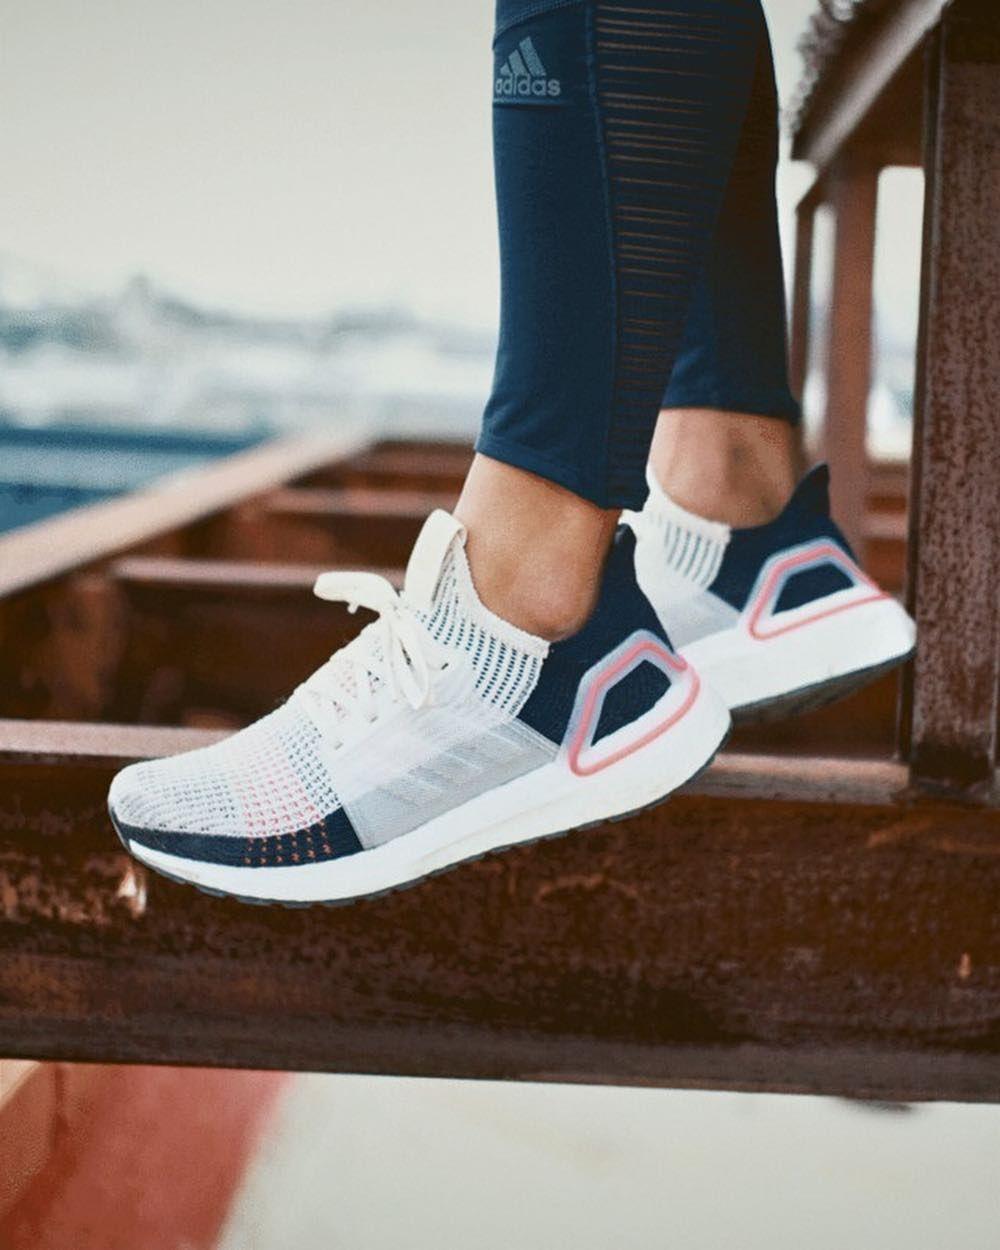 Adidas Originals Ultraboost 19 In Bunt B37705 In 2020 Adidas Shoes Women Cute Sneakers Womens Tennis Shoes